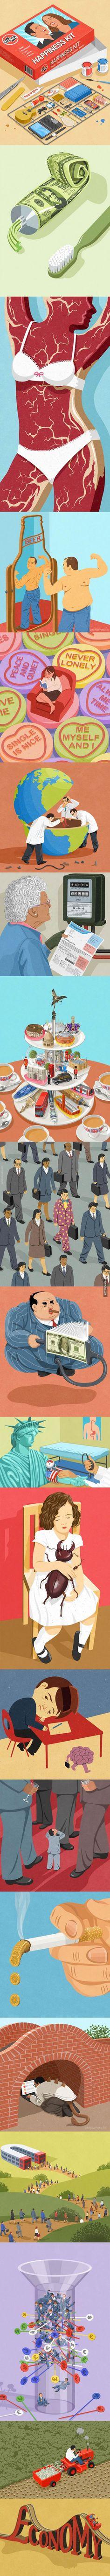 Satirical Illustrations By John Holcrof.